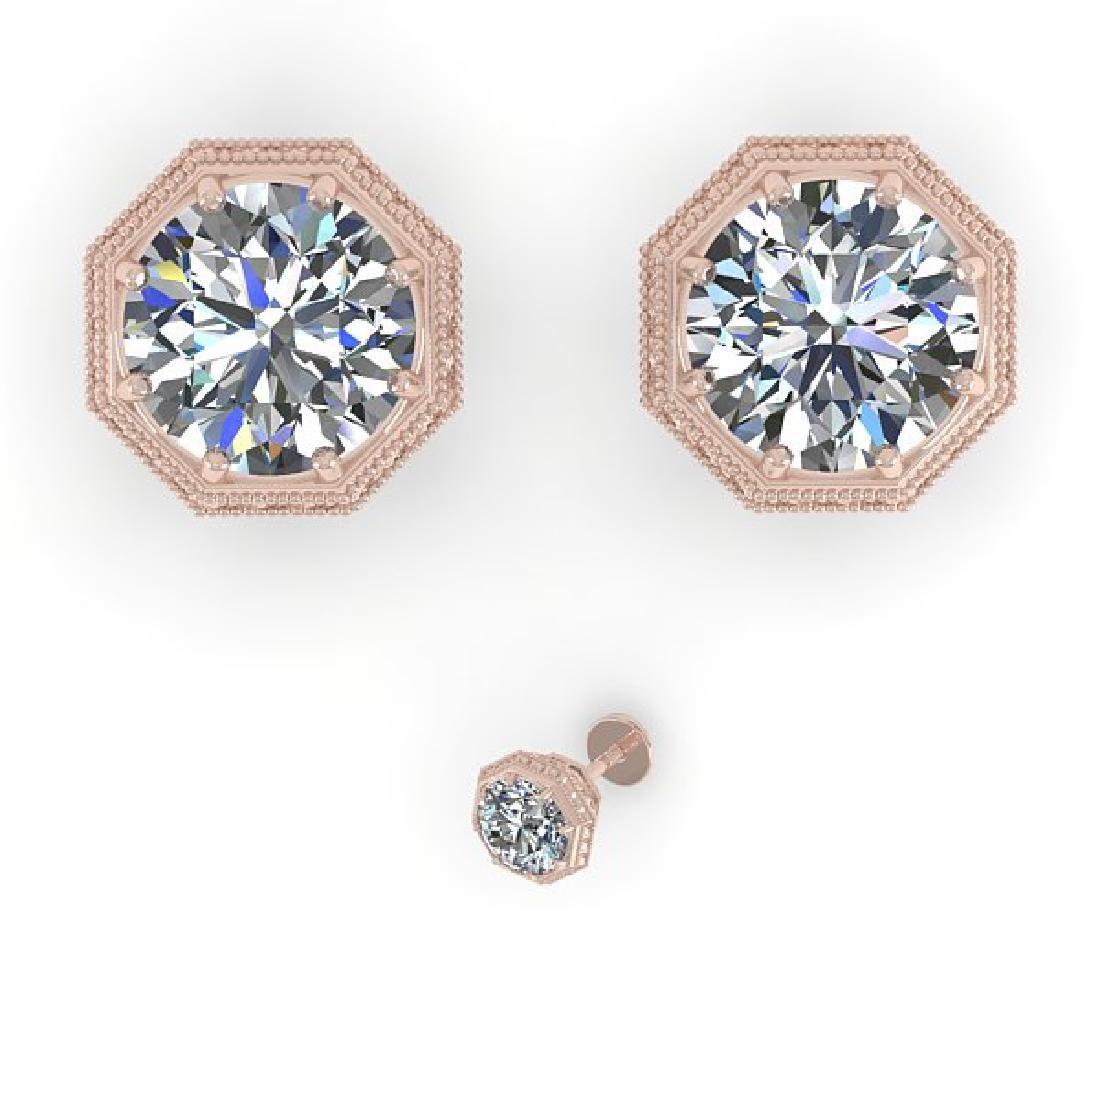 2 CTW VS/SI Diamond Stud Solitaire Earrings 18K Rose